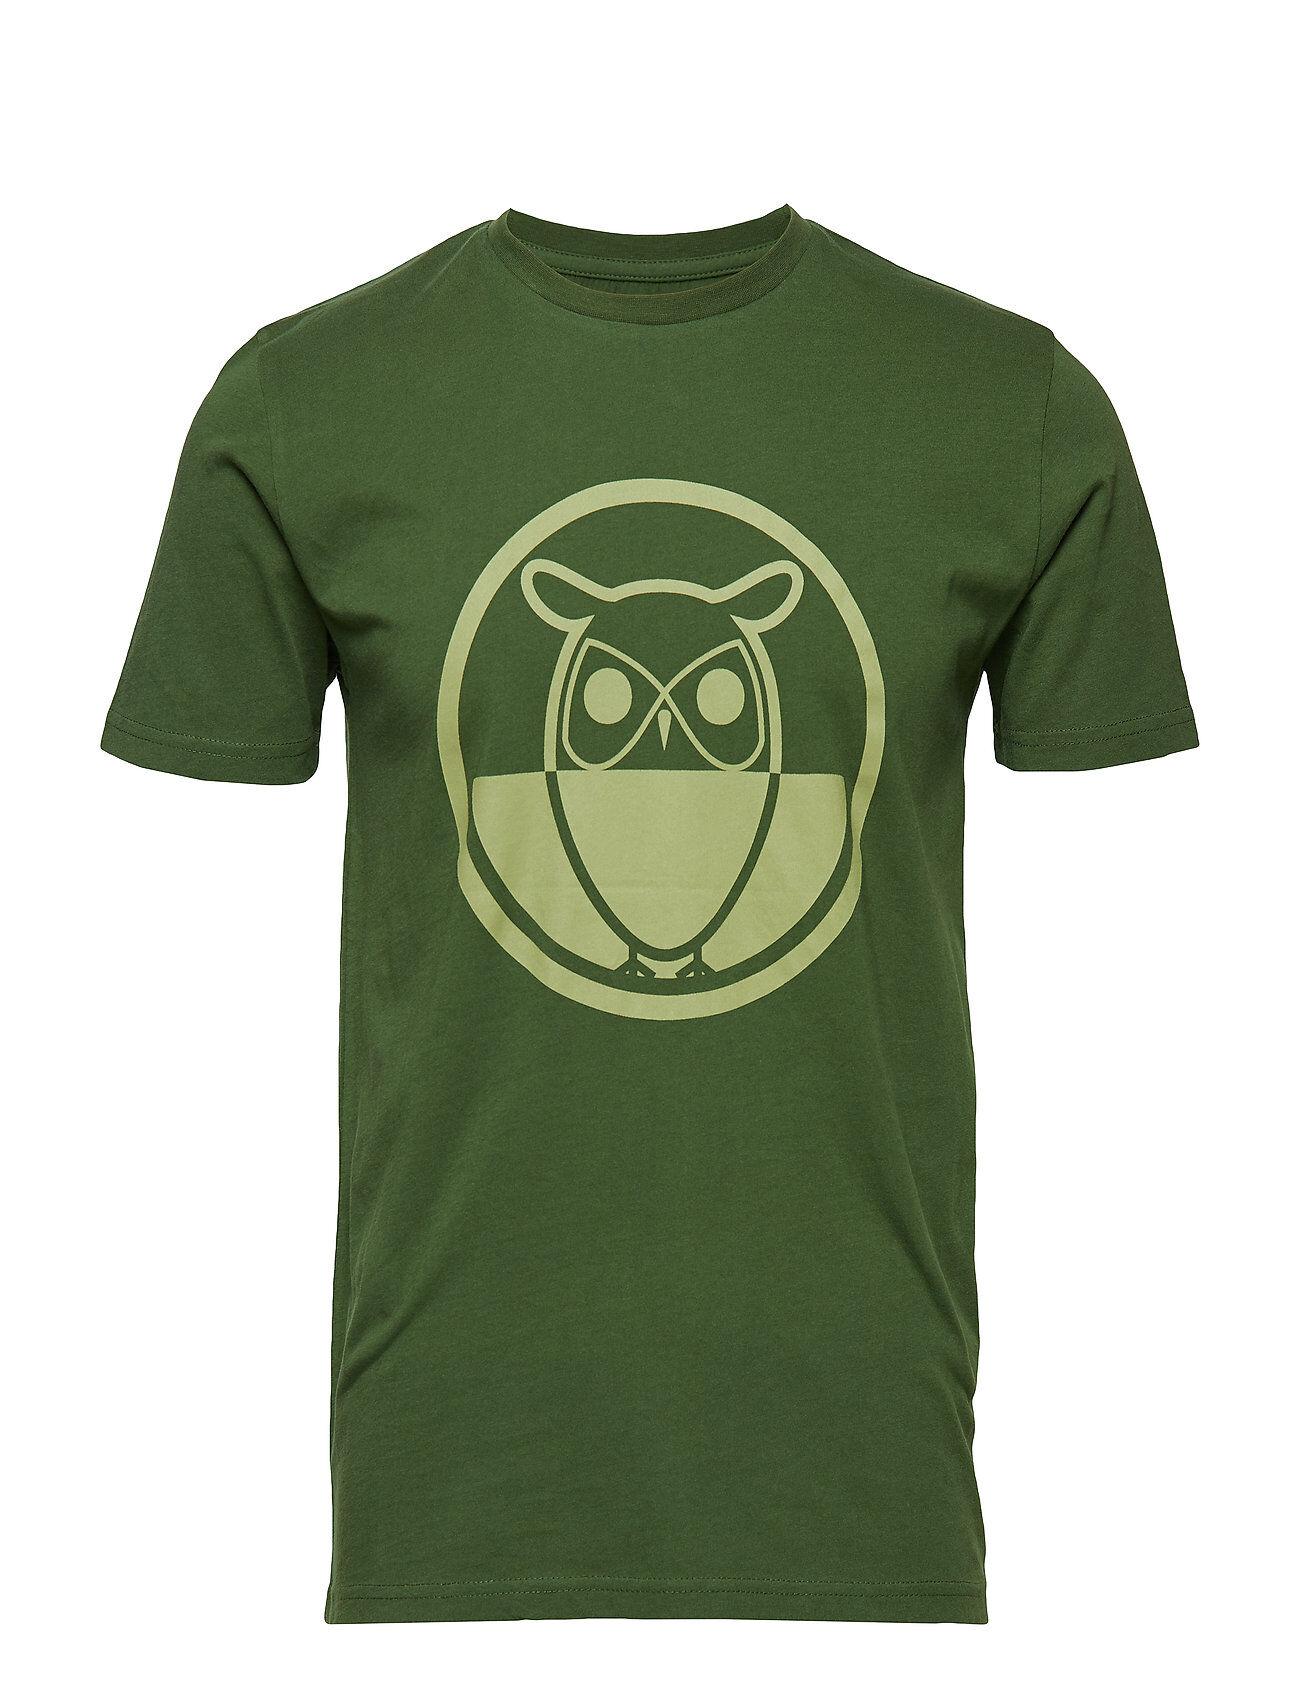 Knowledge Cotton Apparel T-Shirt With Round Logo Print - Got